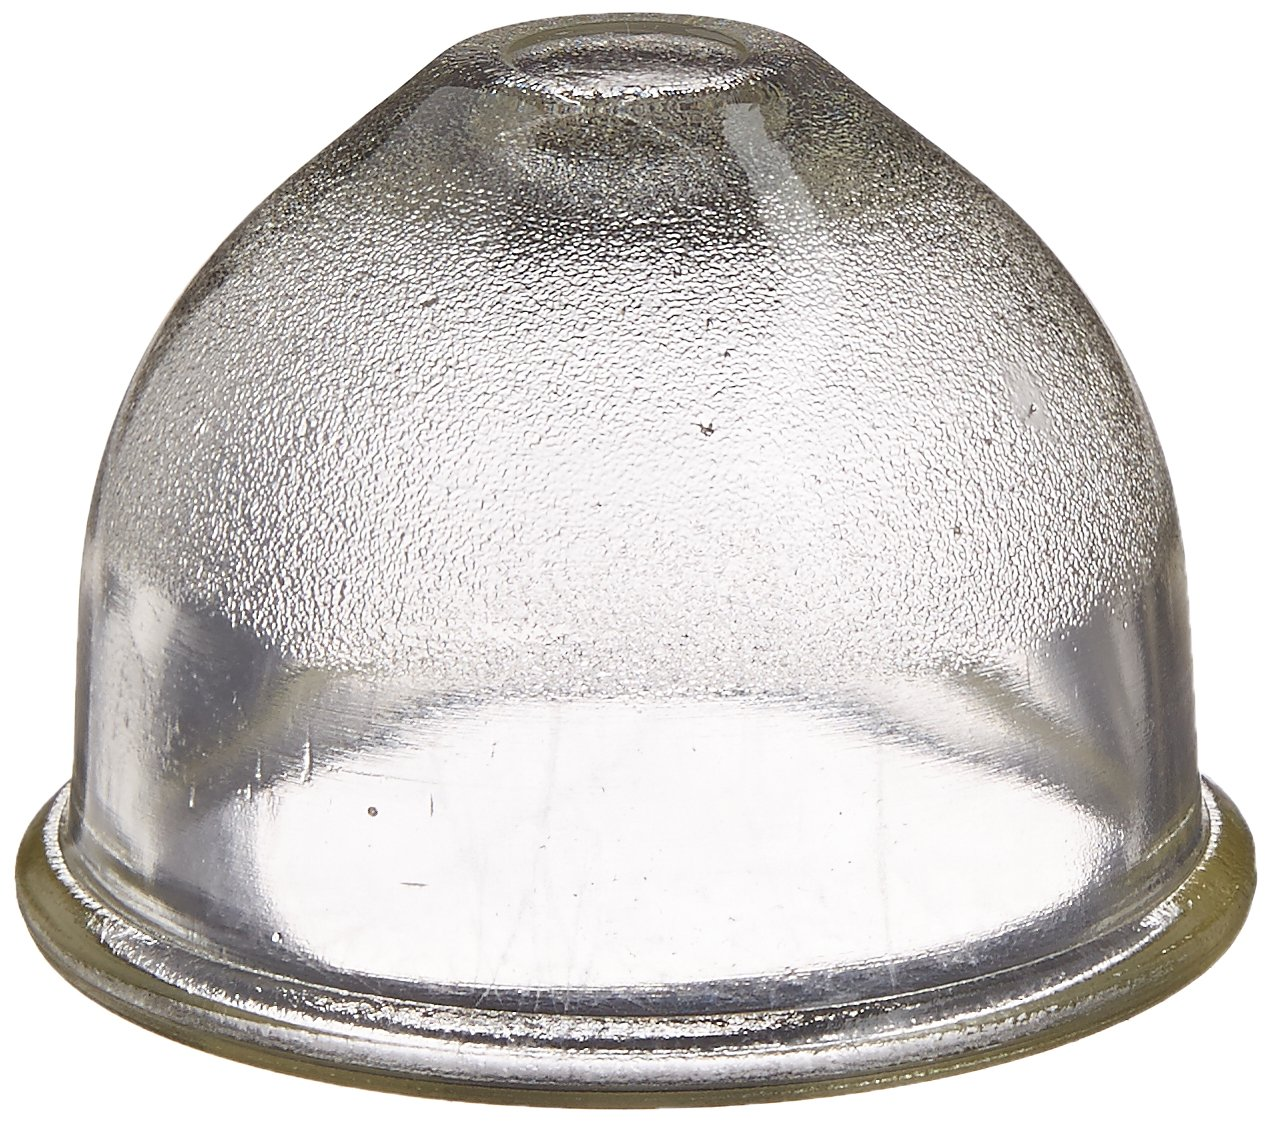 Frigidaire 318406100 Range/Stove/Oven Light Lens Cover